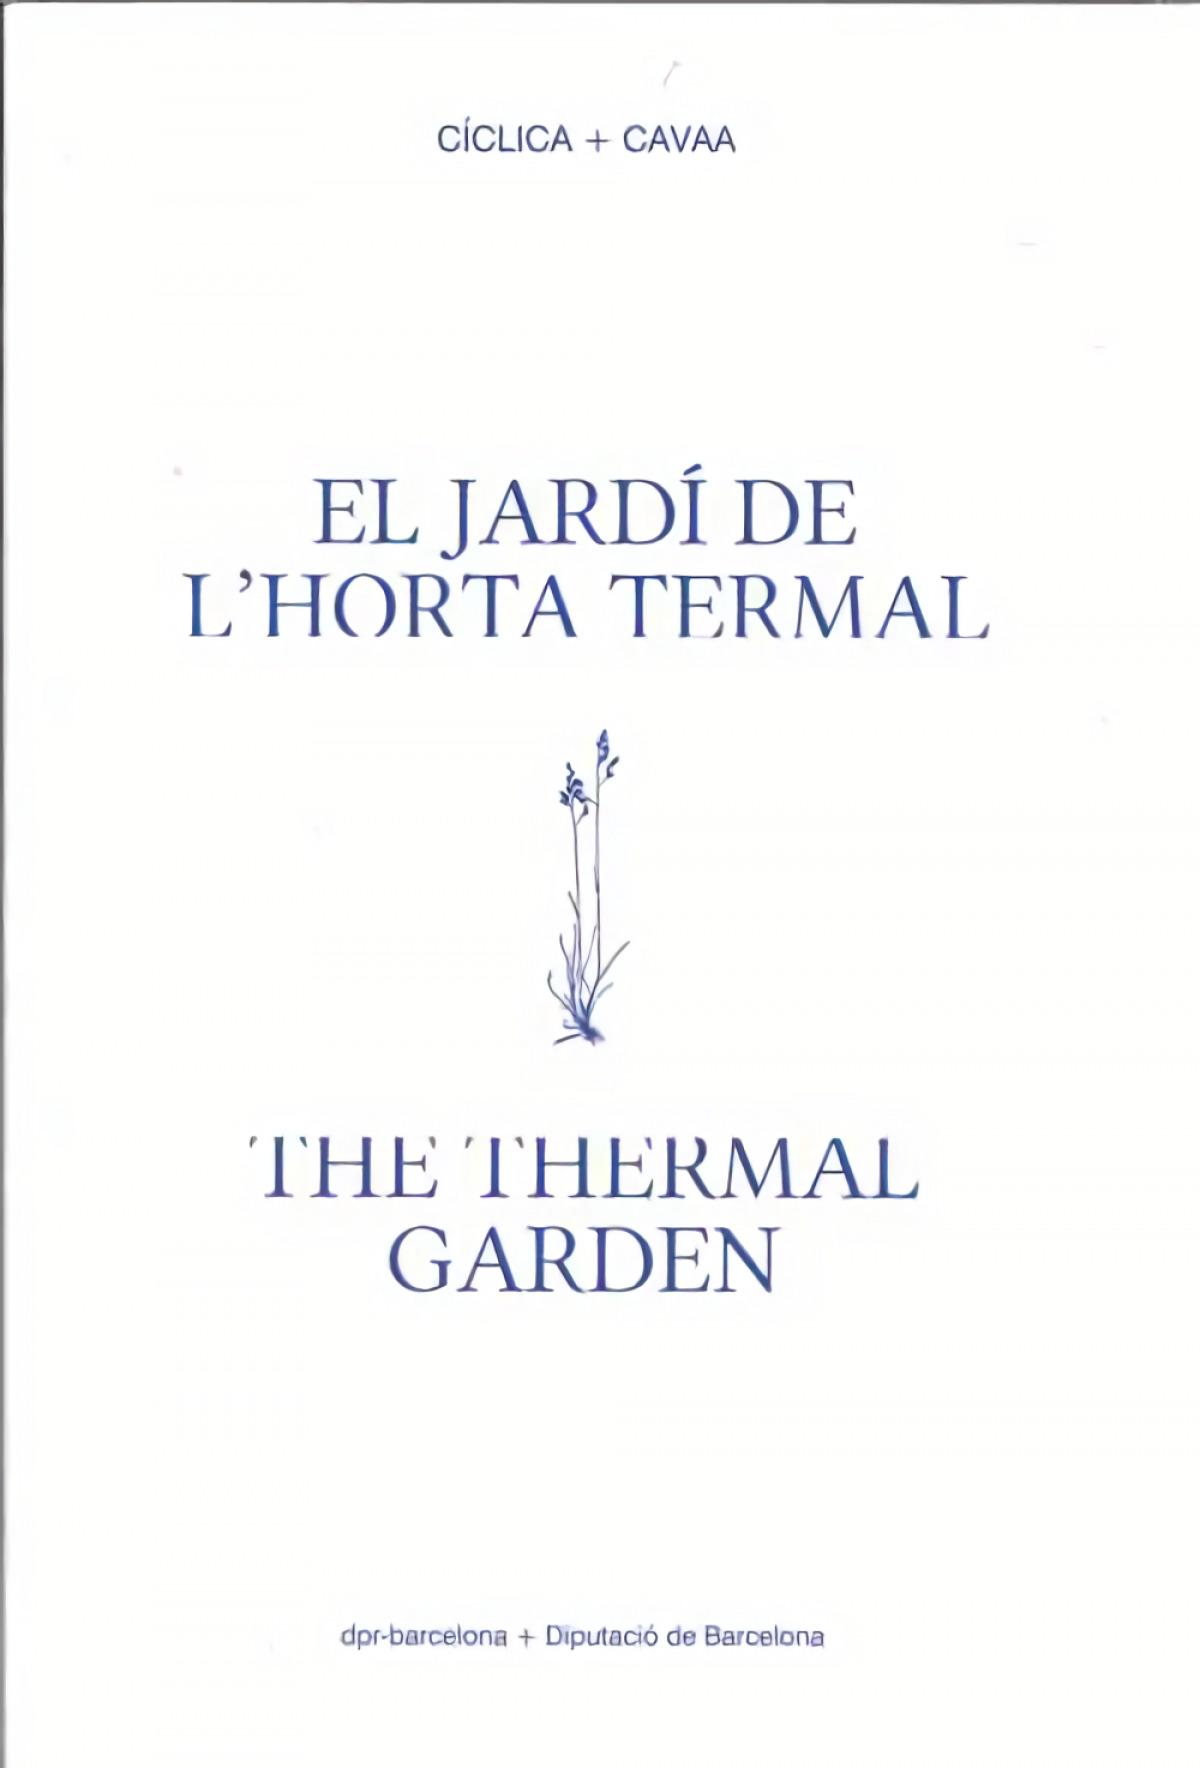 El Jard¡ de l'Horta Termal / The Thermal Garden